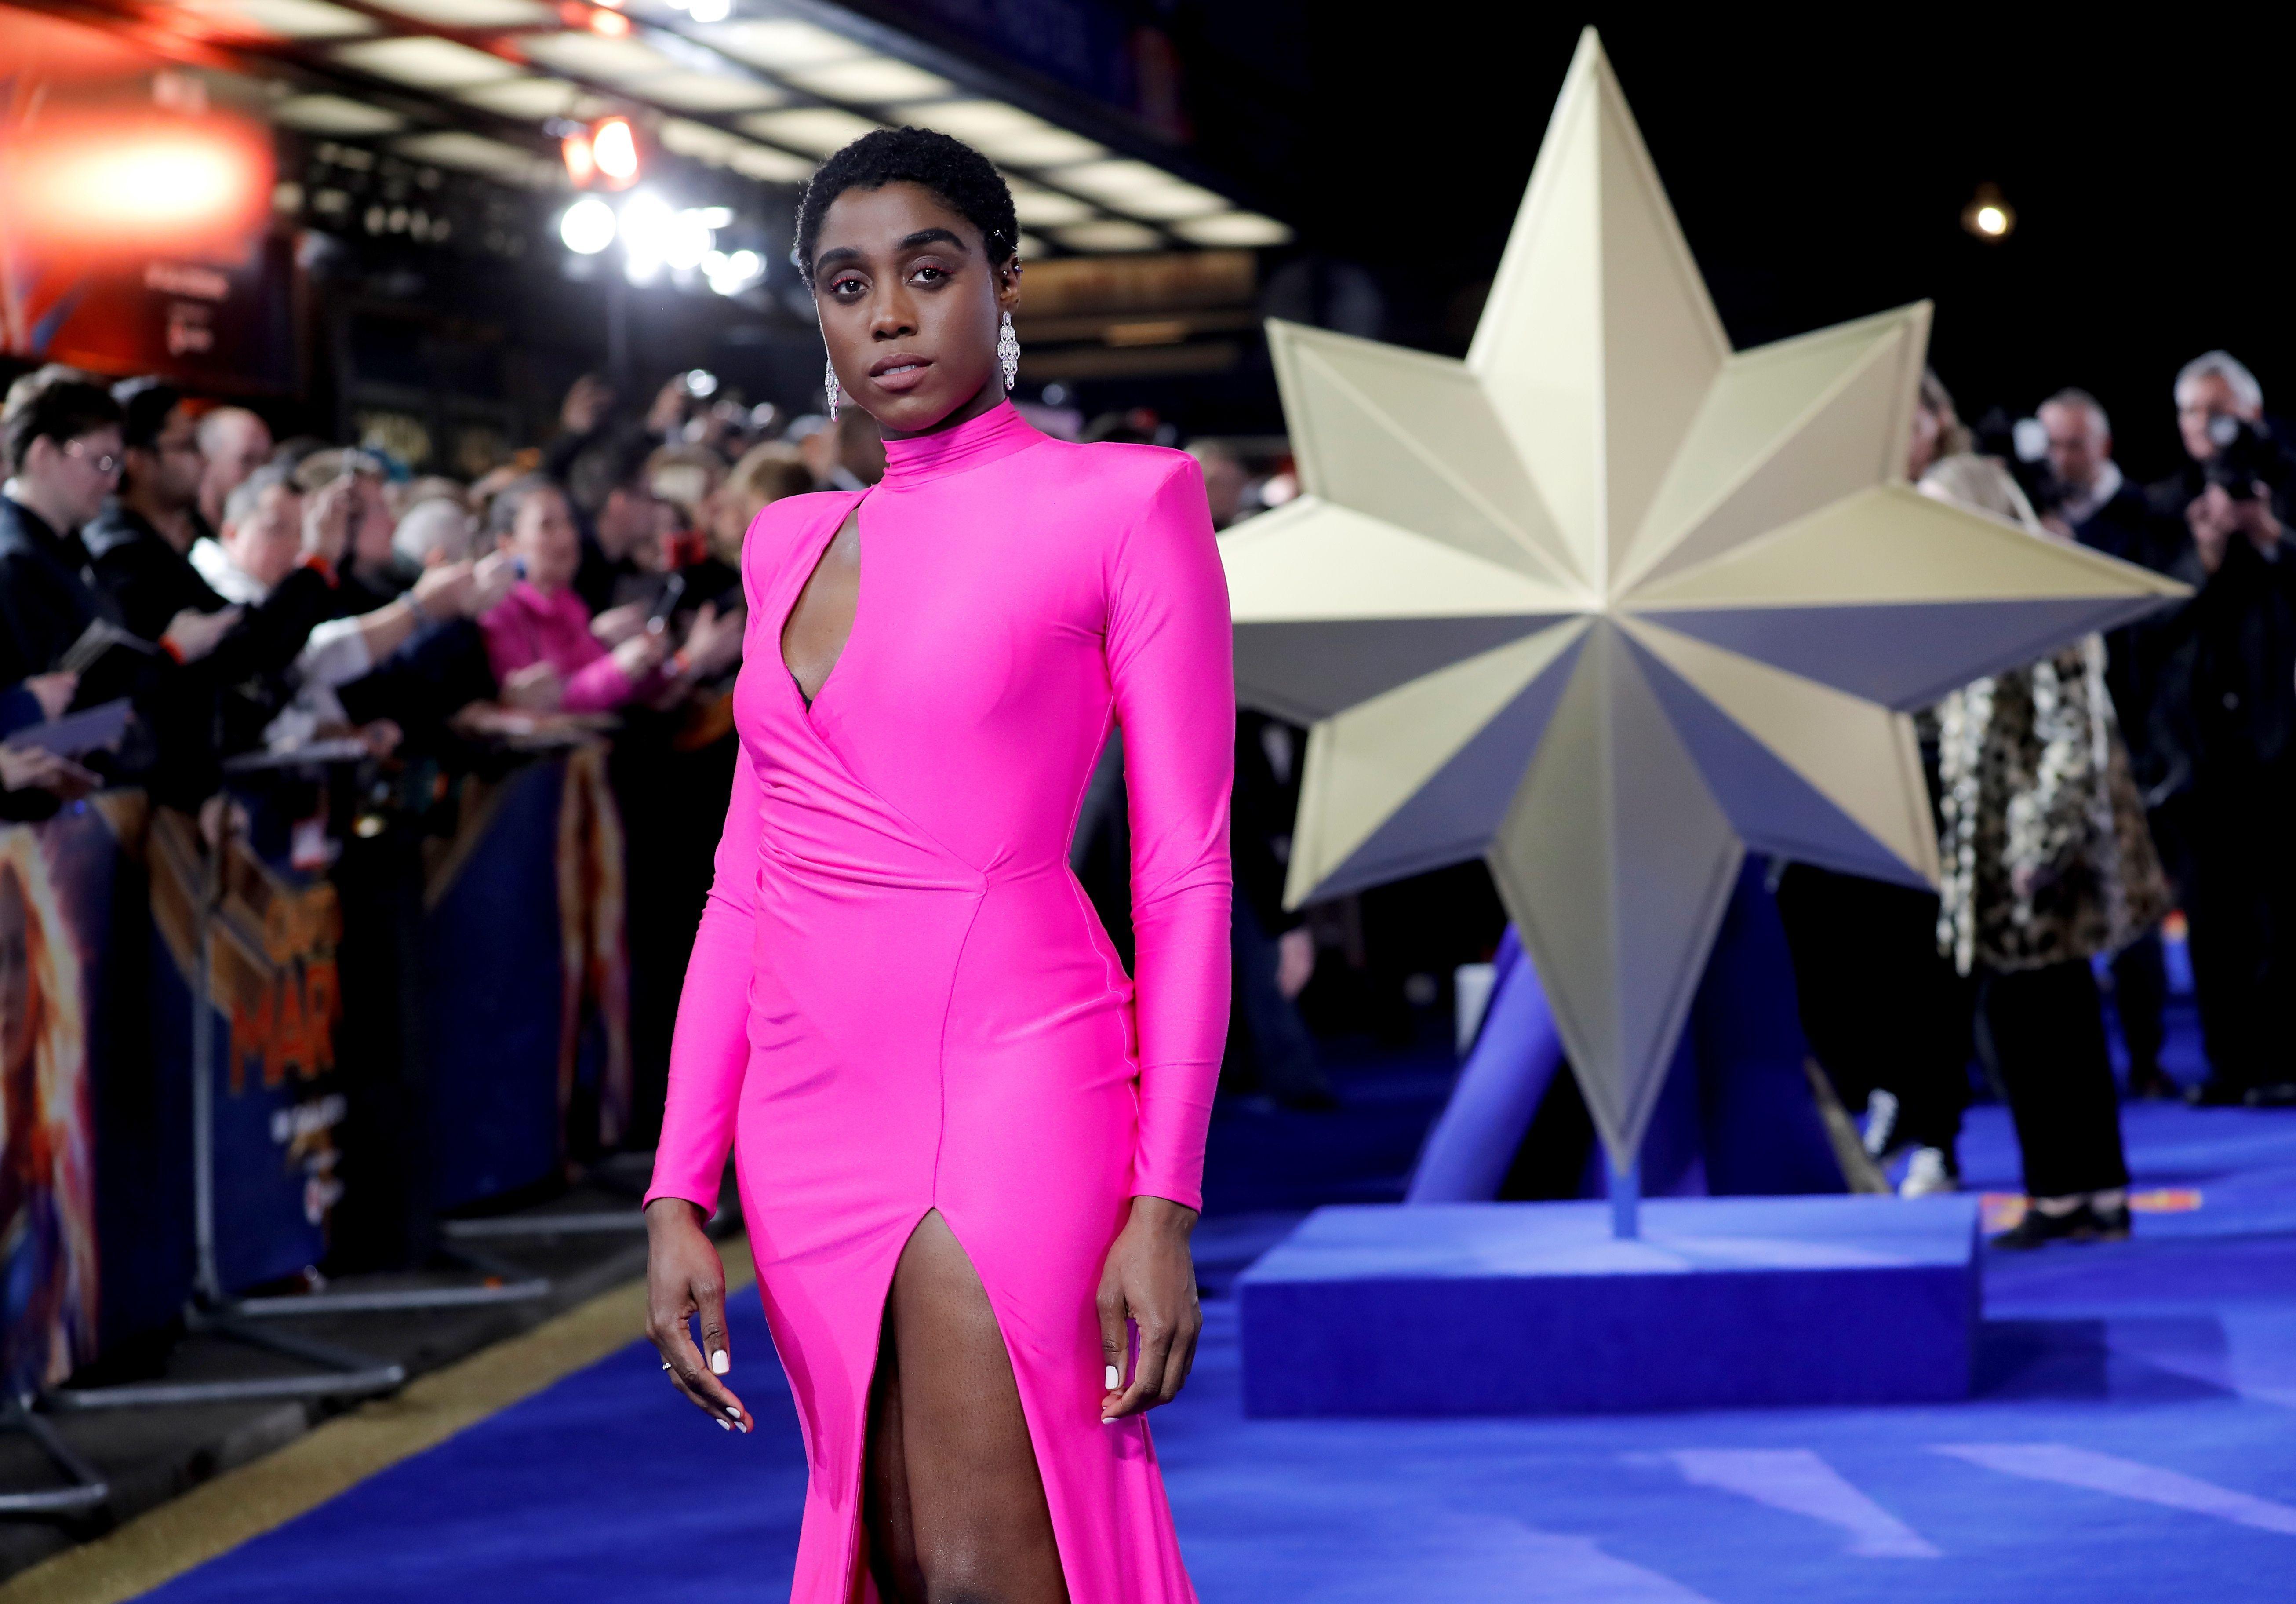 Who Is Lashana Lynch, the New 007?